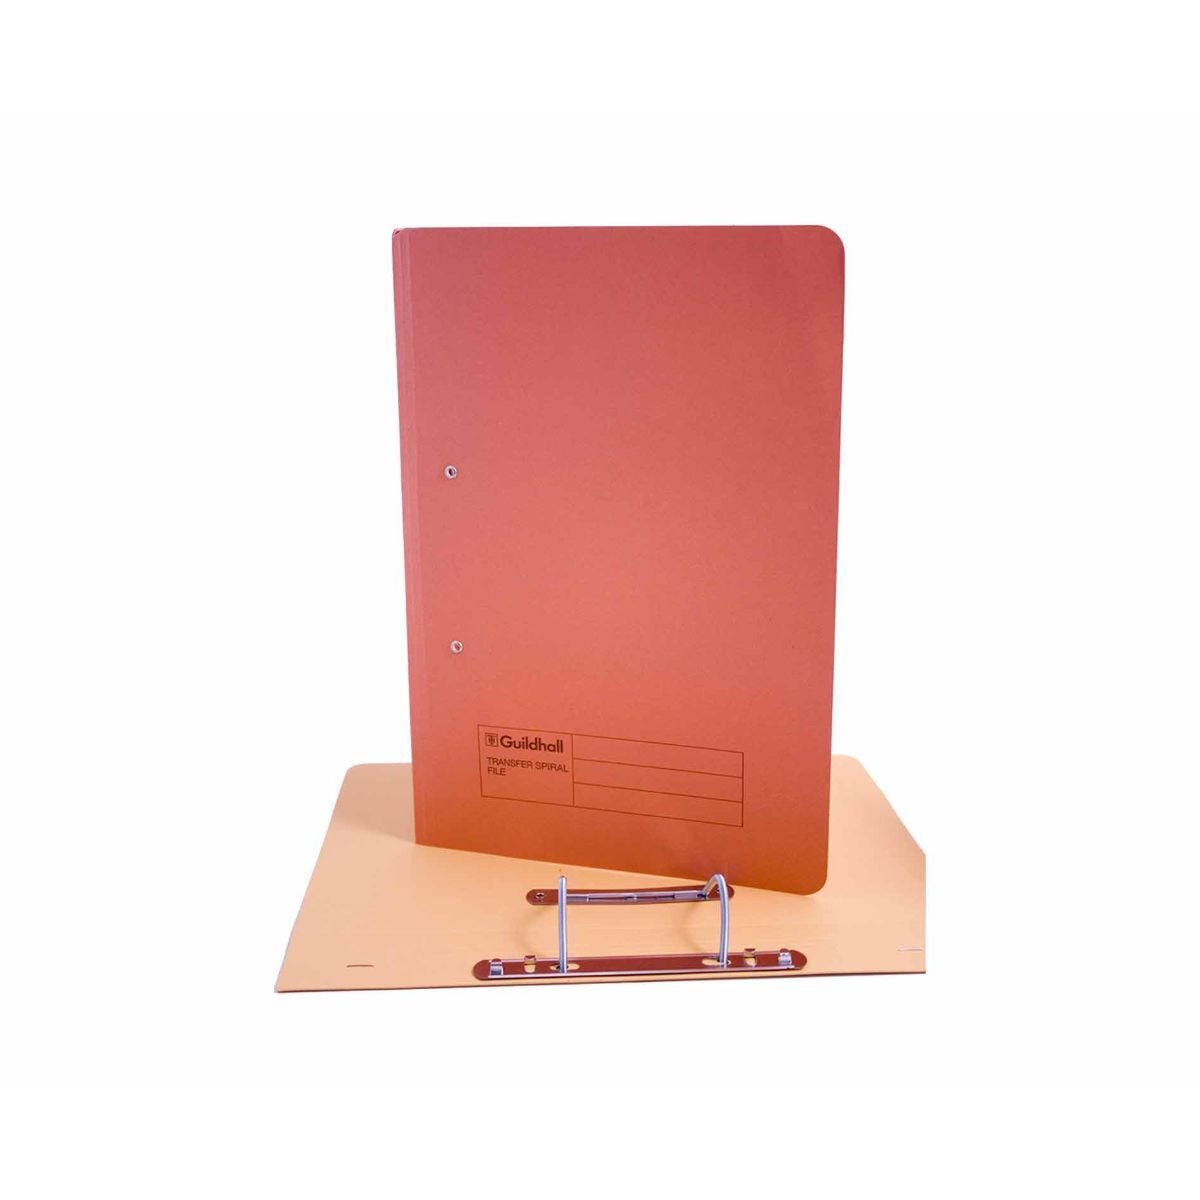 Exacompta Guildhall Spiral File Foolscap Pack of 50 315gsm Orange